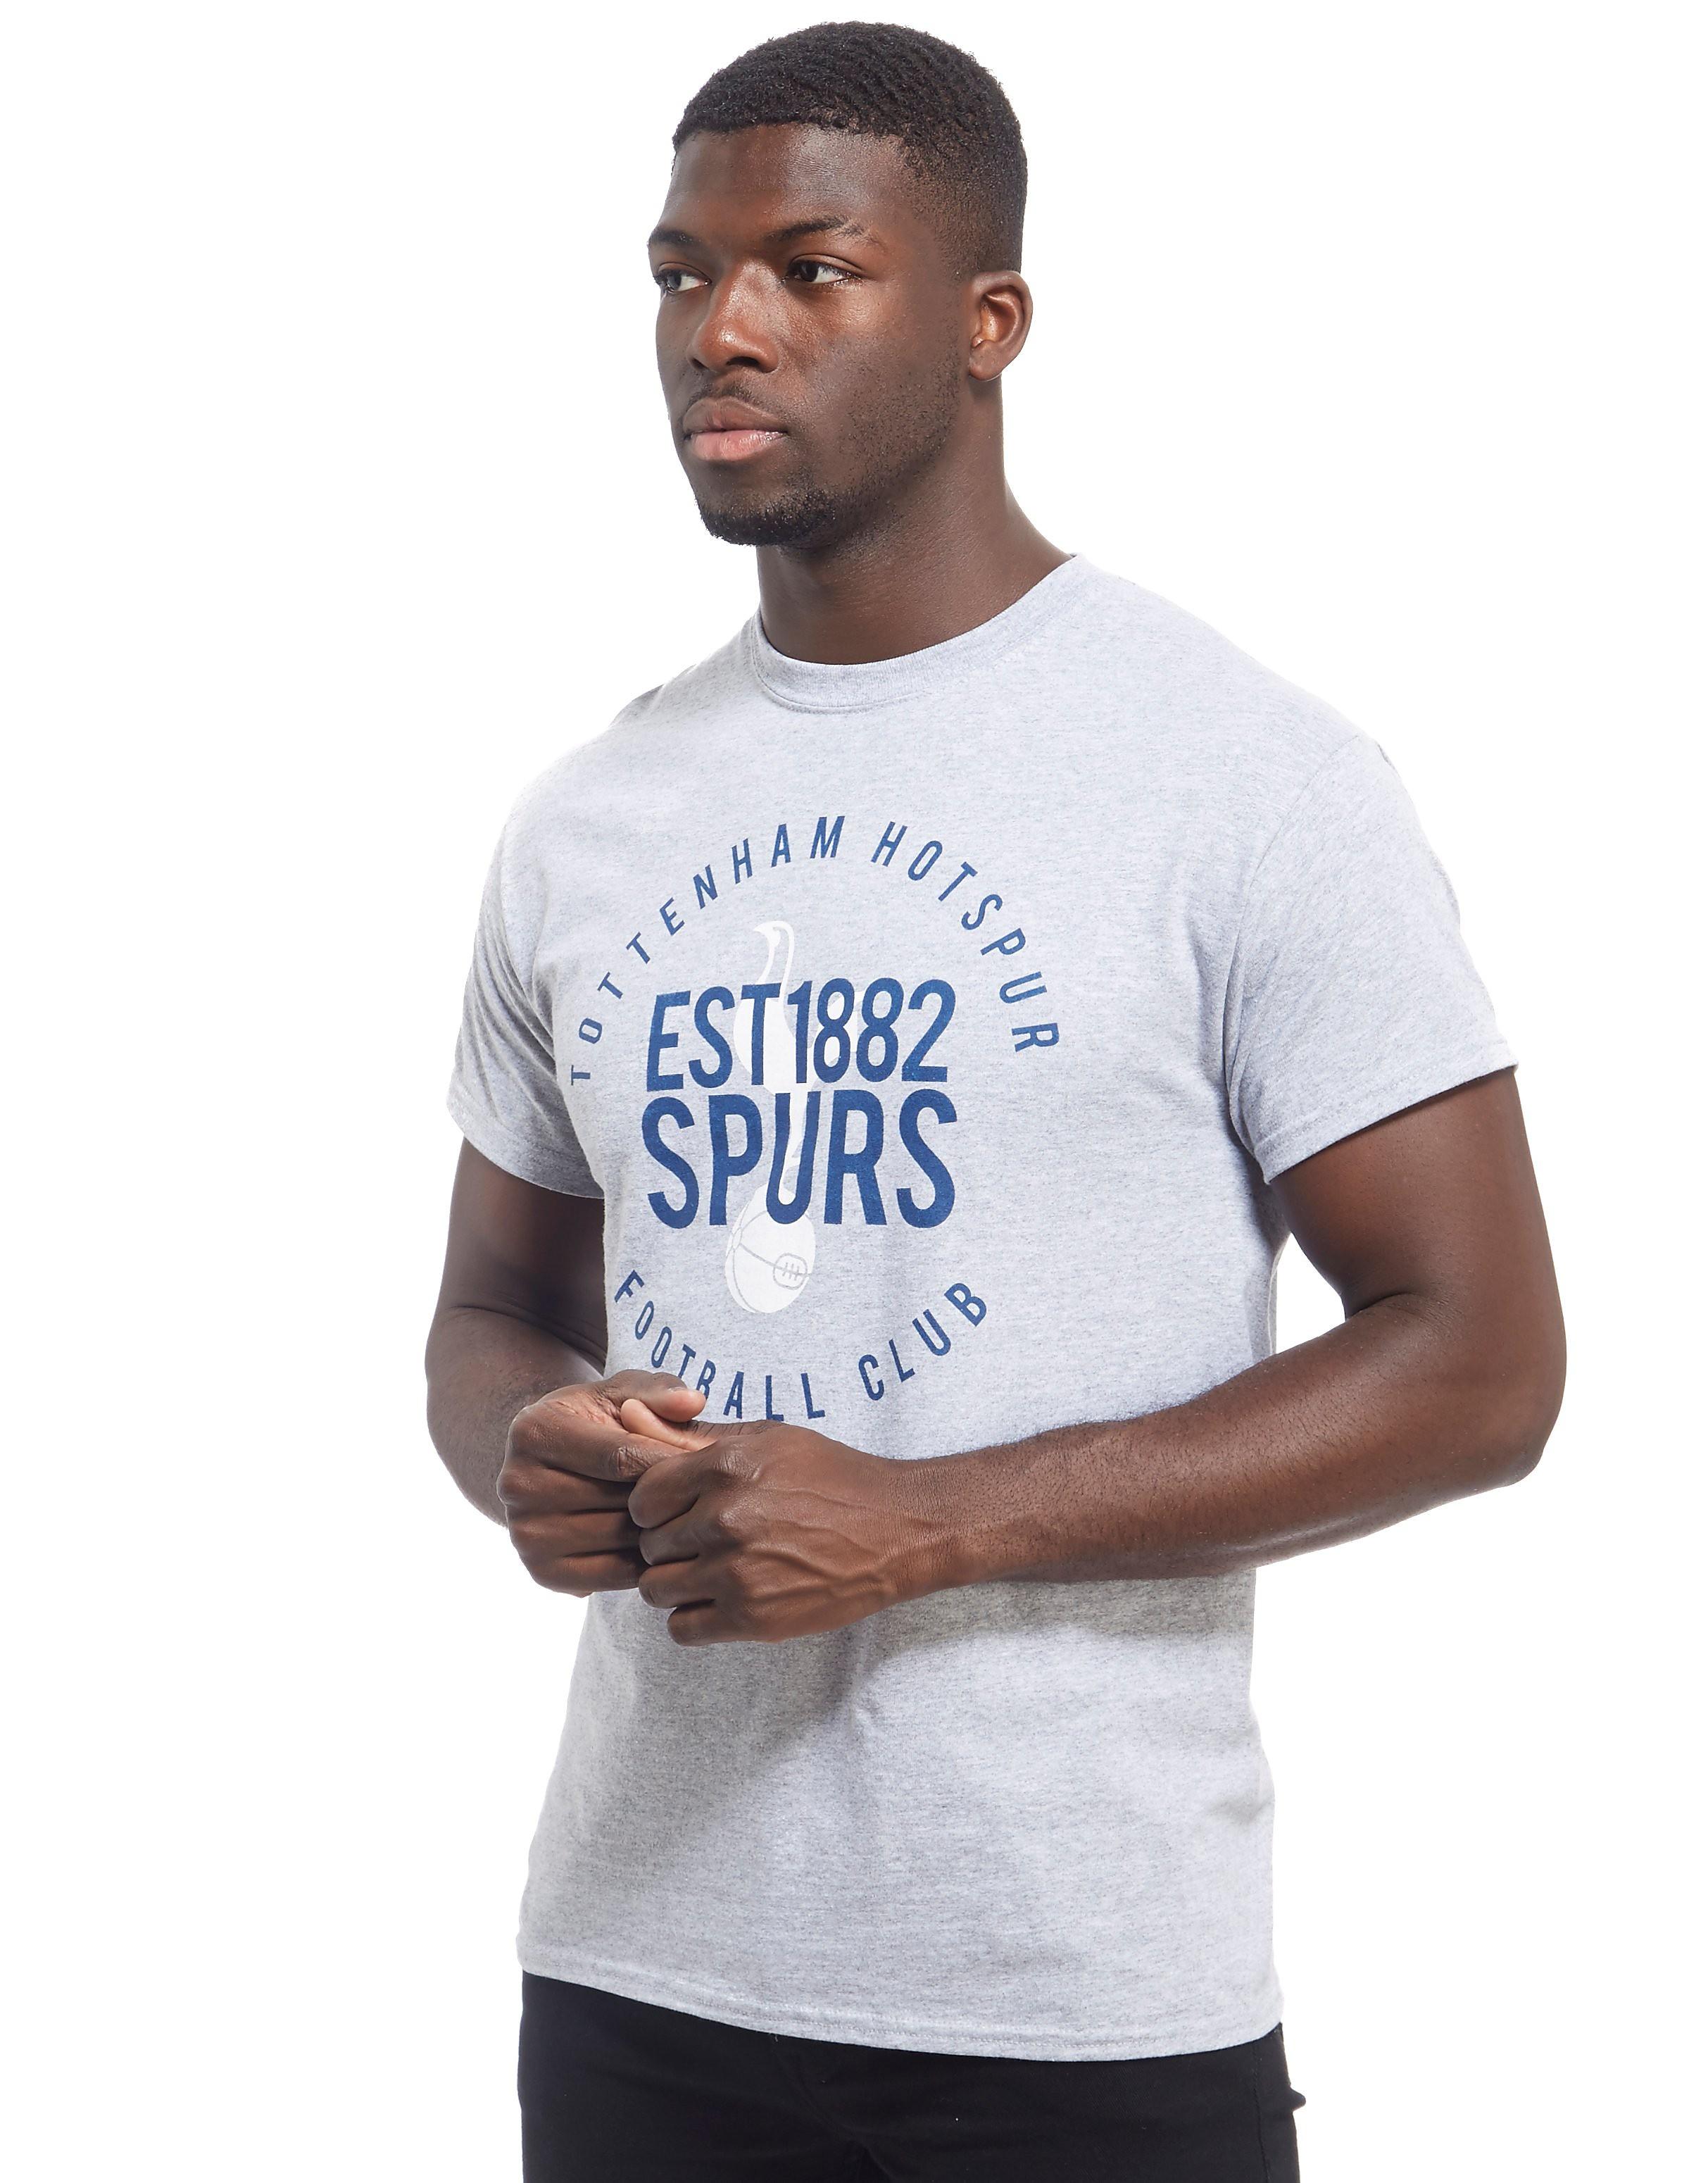 SOURCE LAB LTD Tottenham Hotspur 2017 T-Shirt